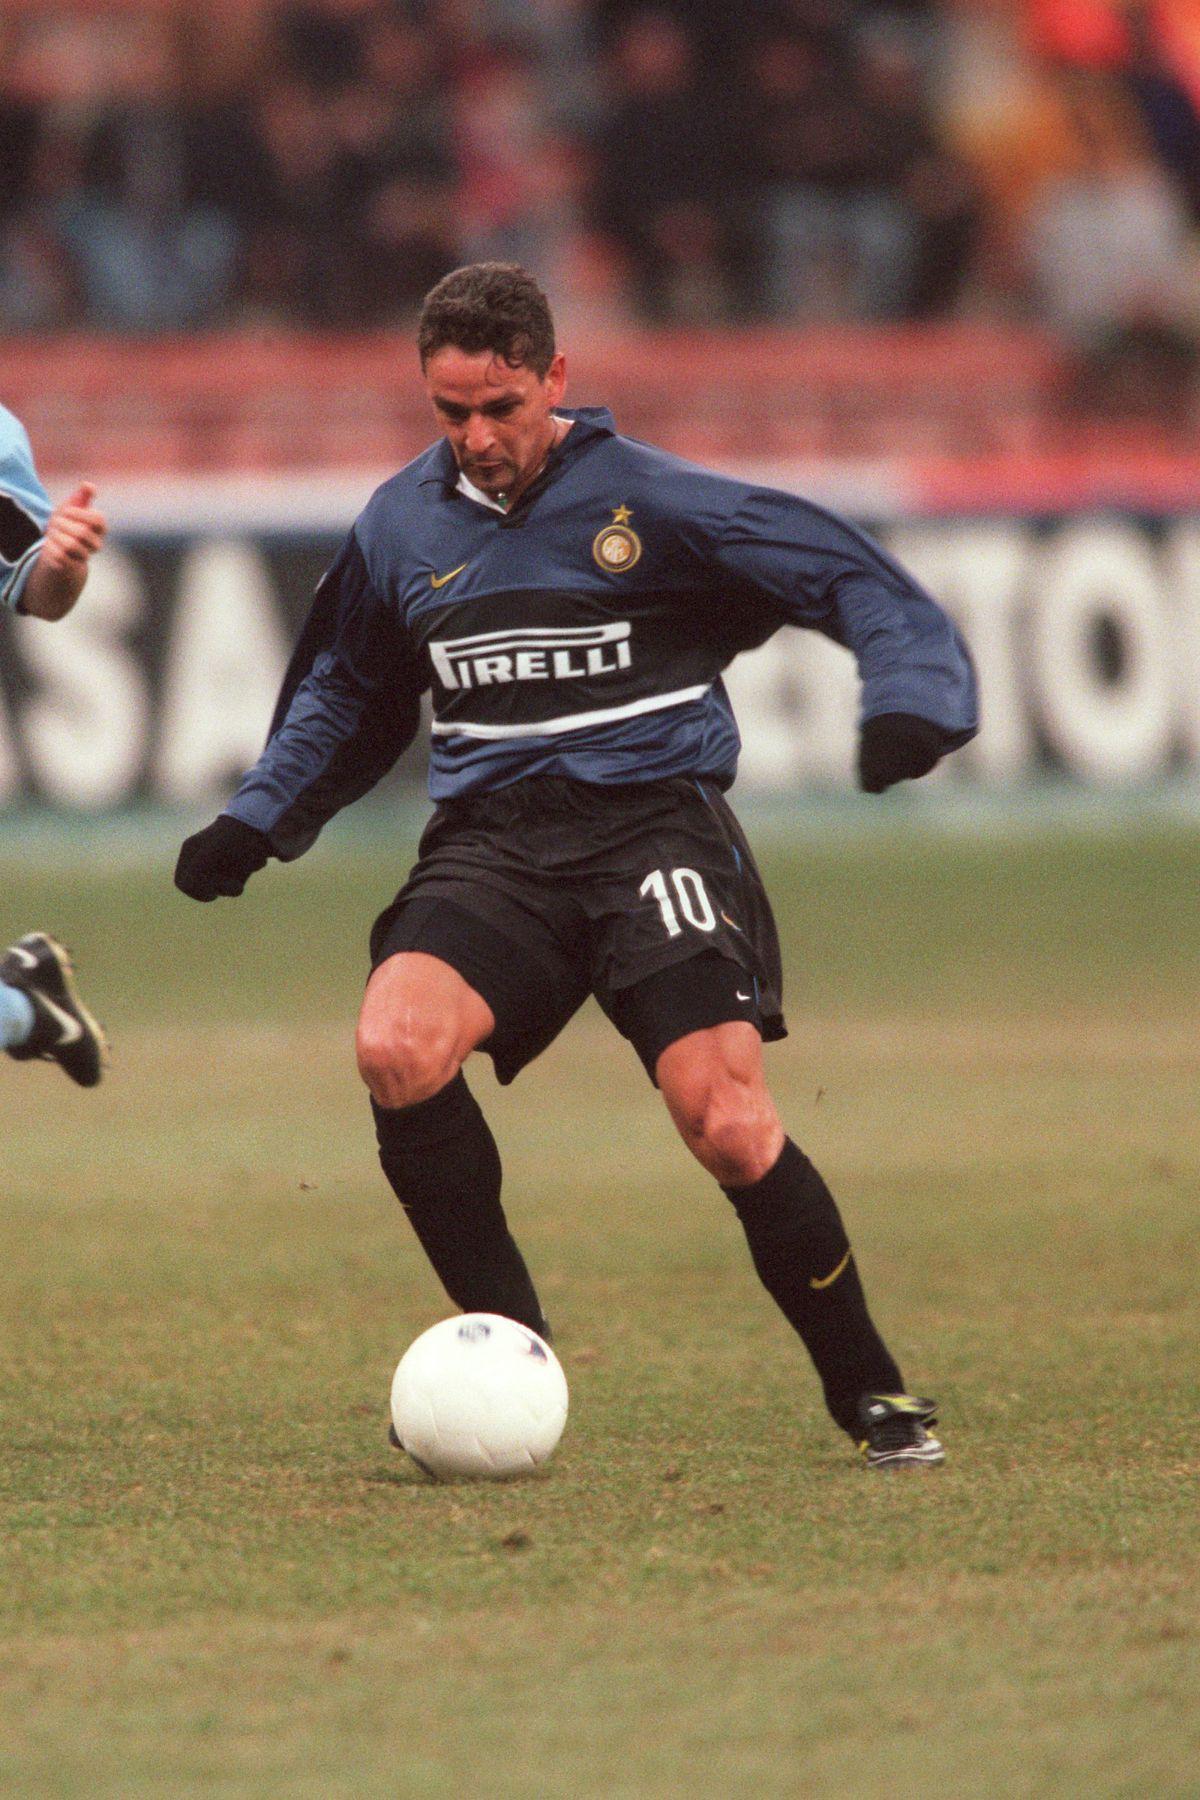 Italian Soccer - Italian Cup - Inter Milan v Lazio